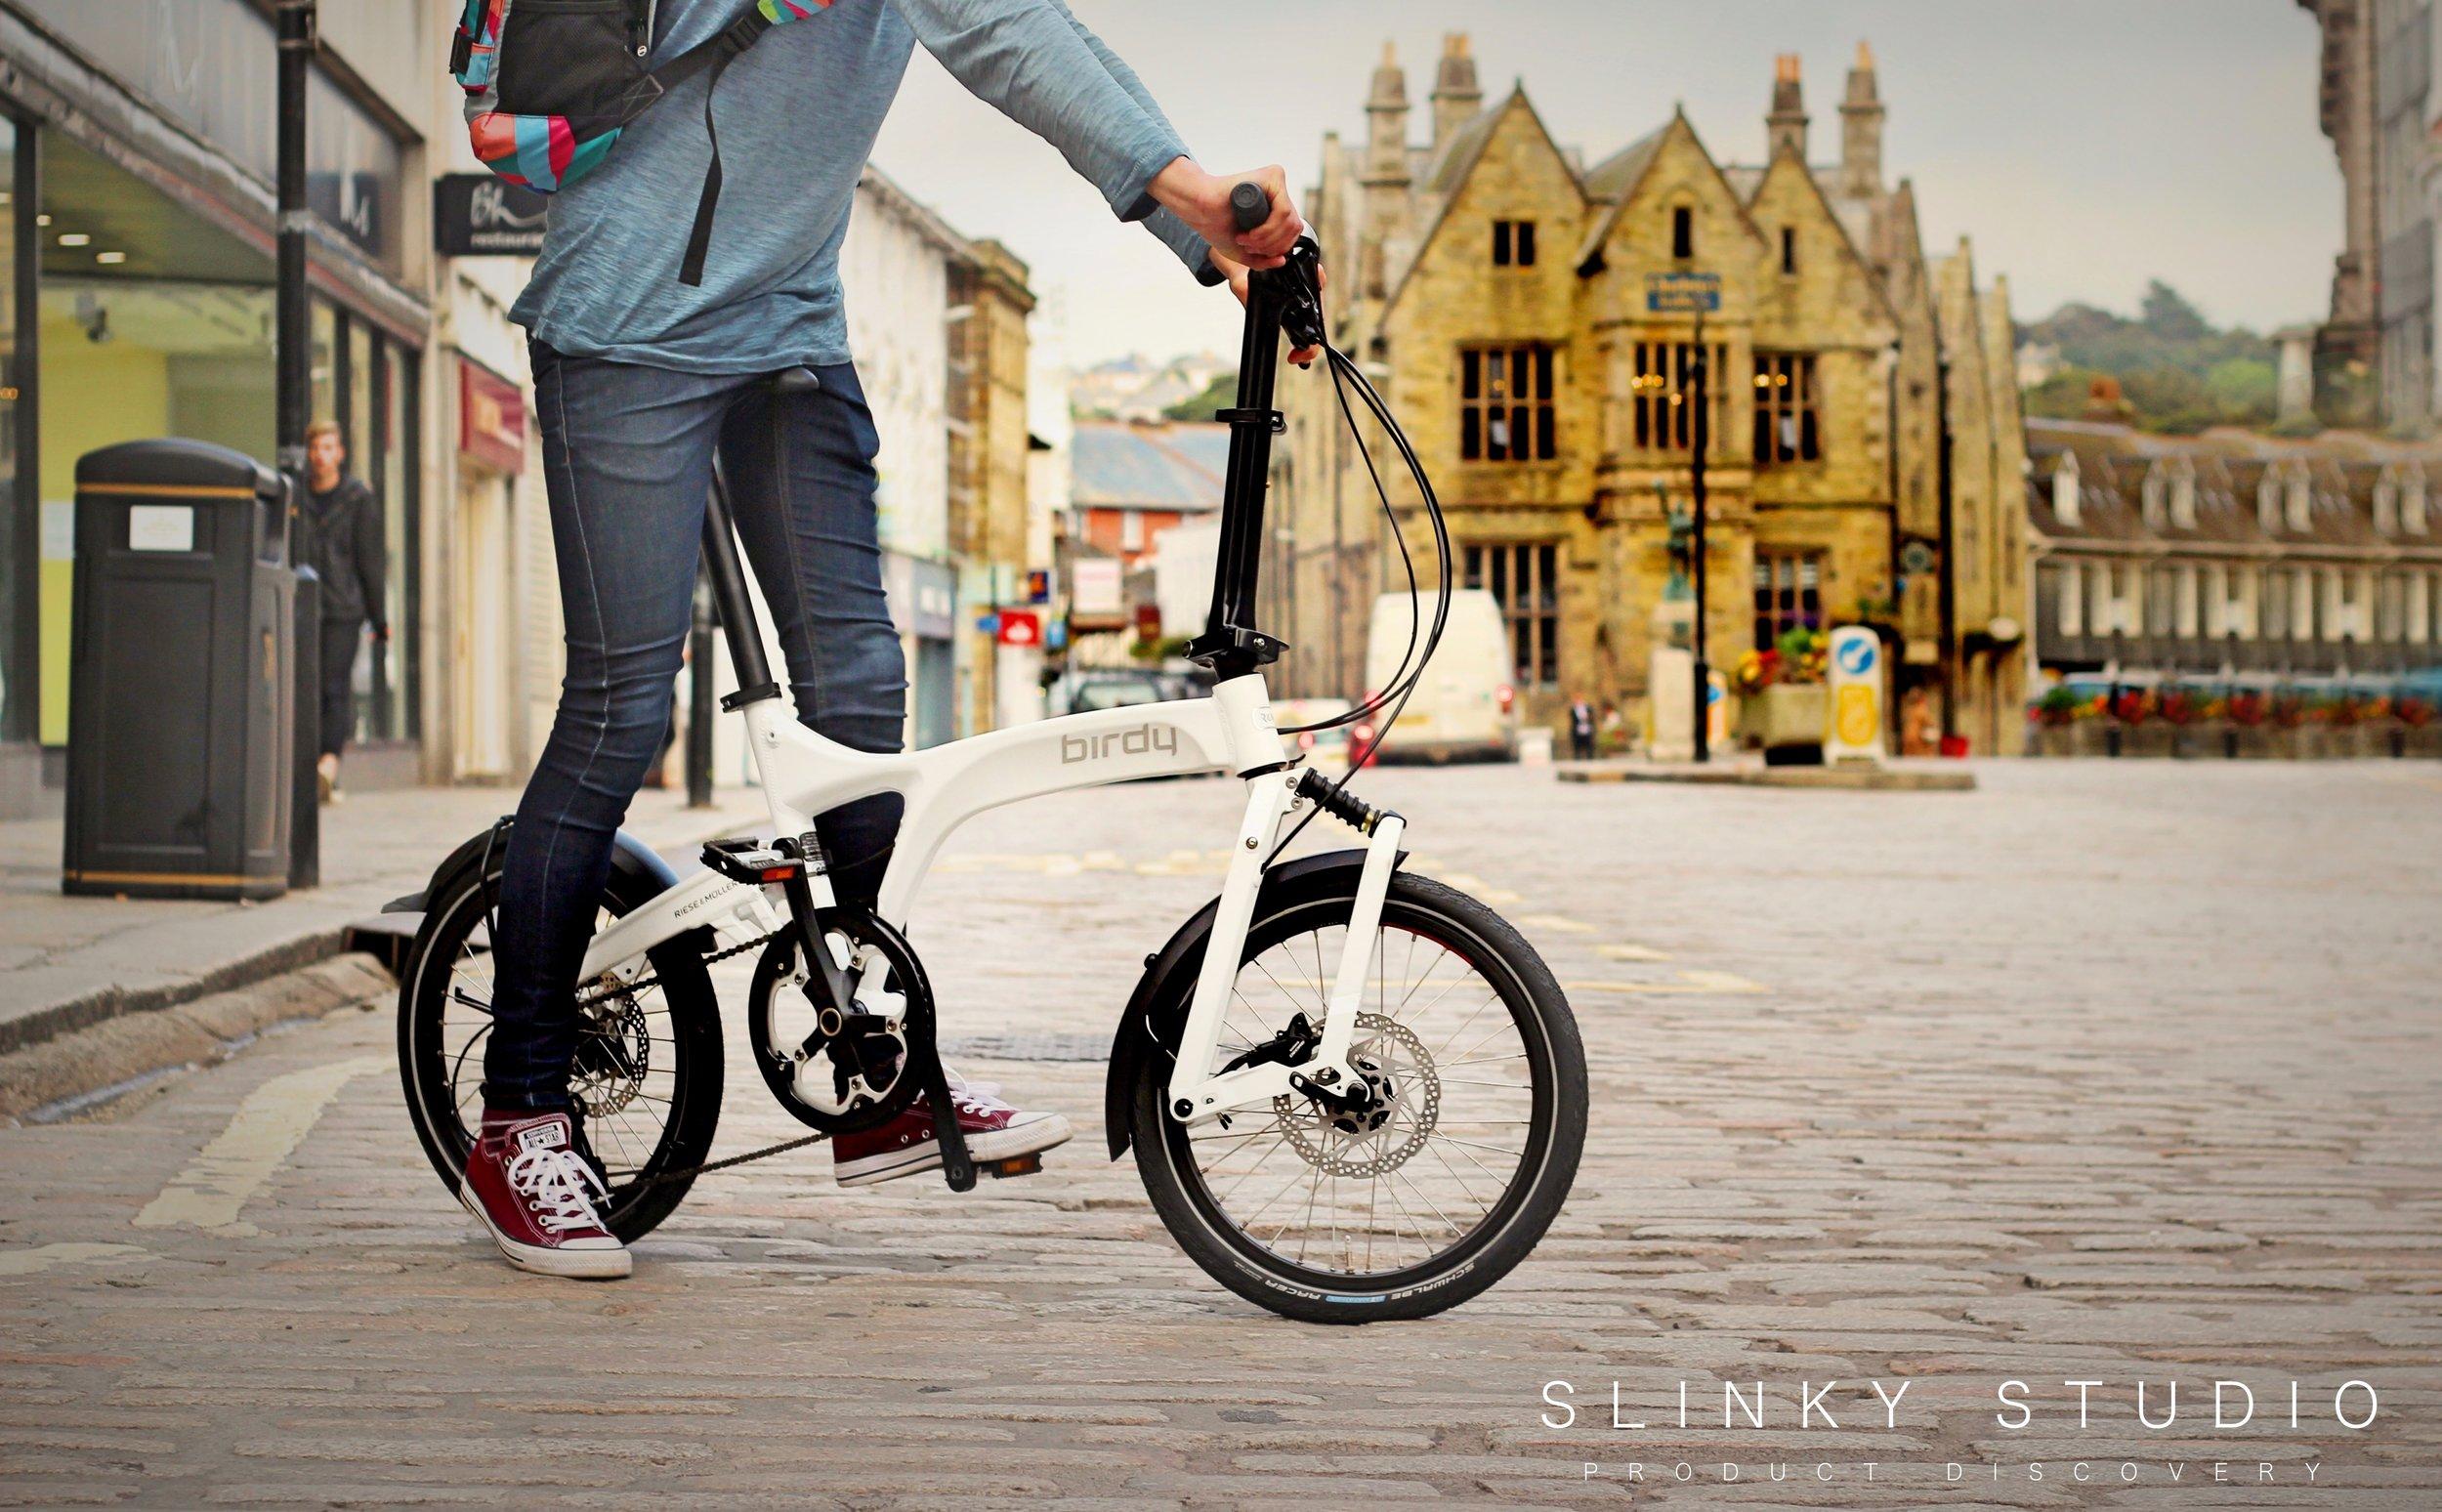 Birdy Speed Folding Bike Riding on Scenic Cobbled European City.jpg